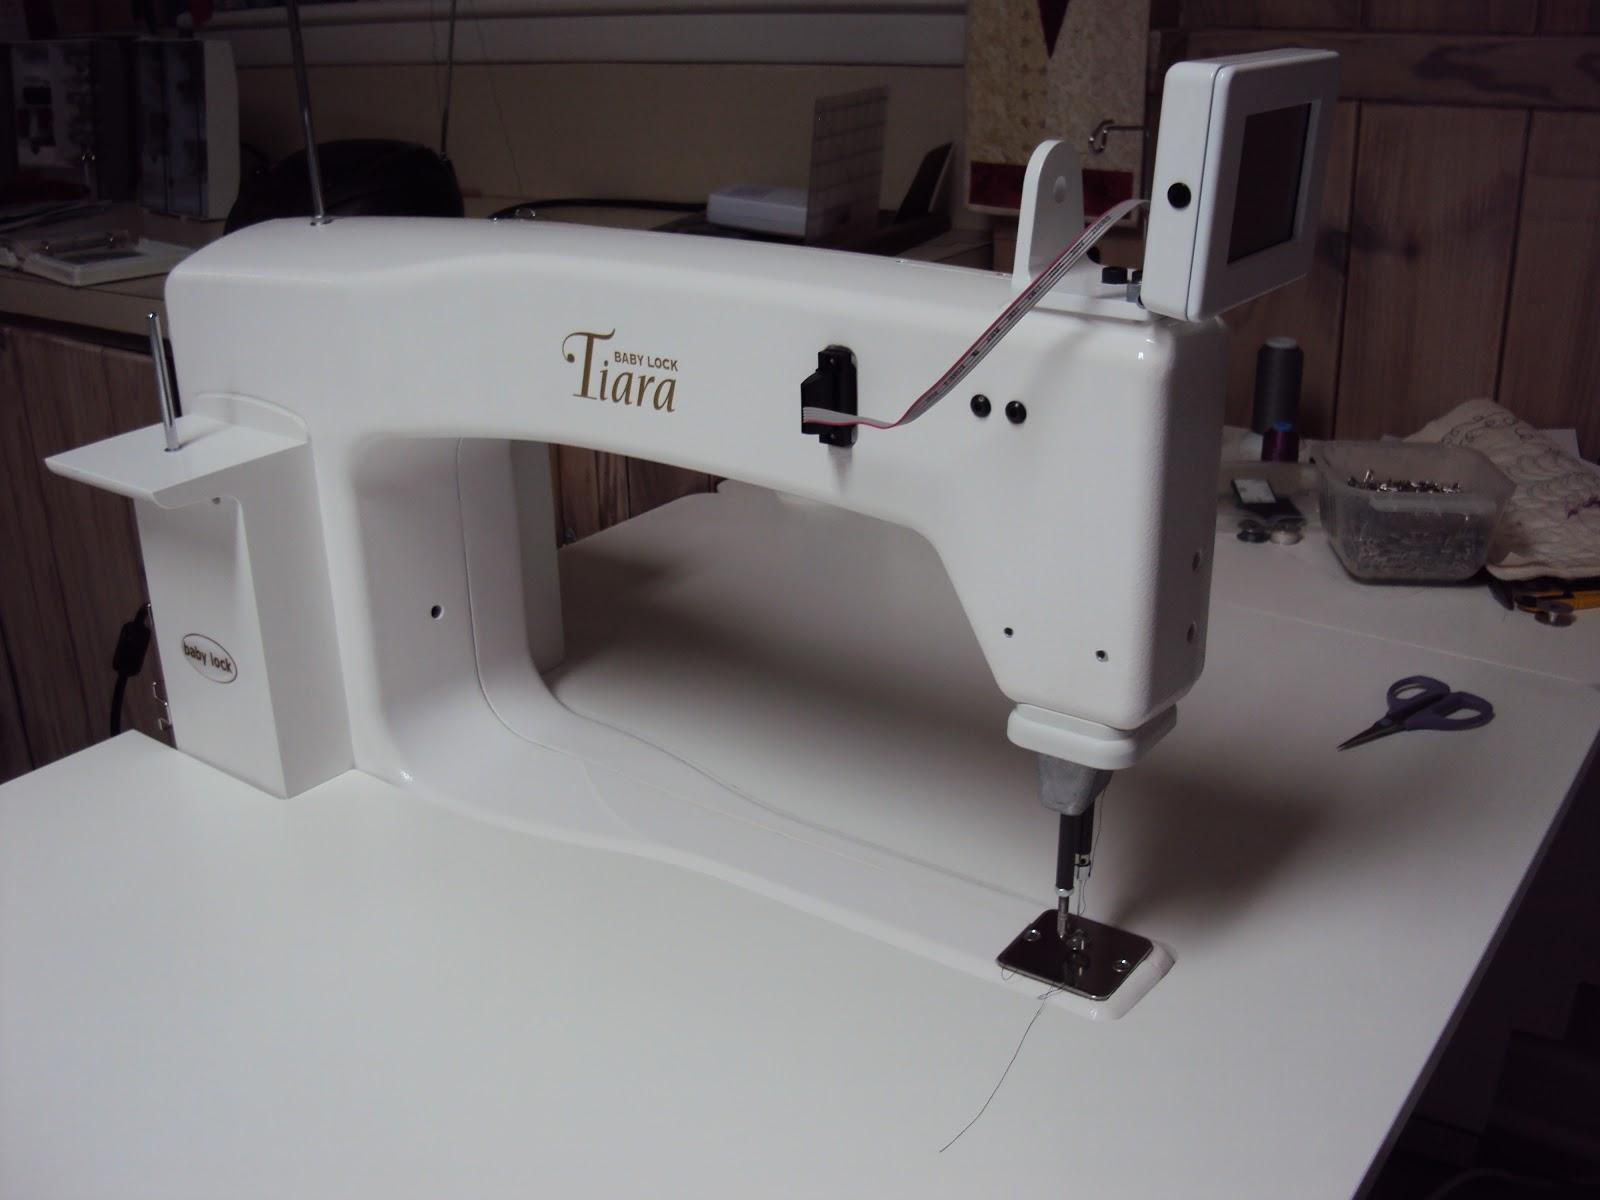 george mid arm quilting machine